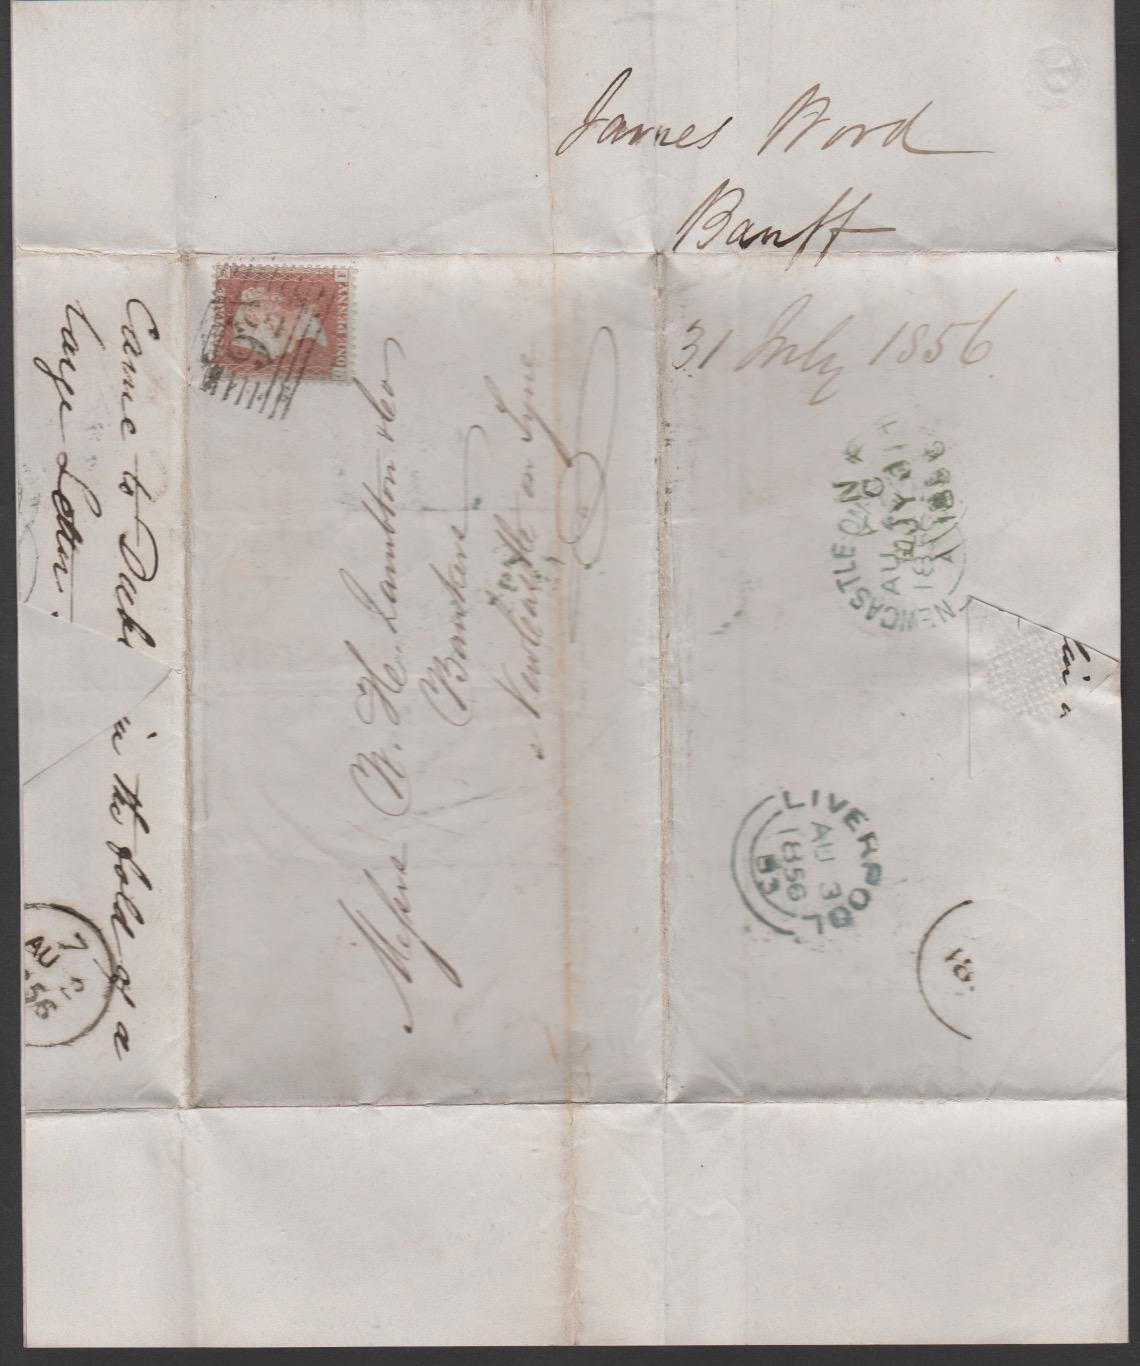 G.B. - Ireland 1856 - Image 4 of 4